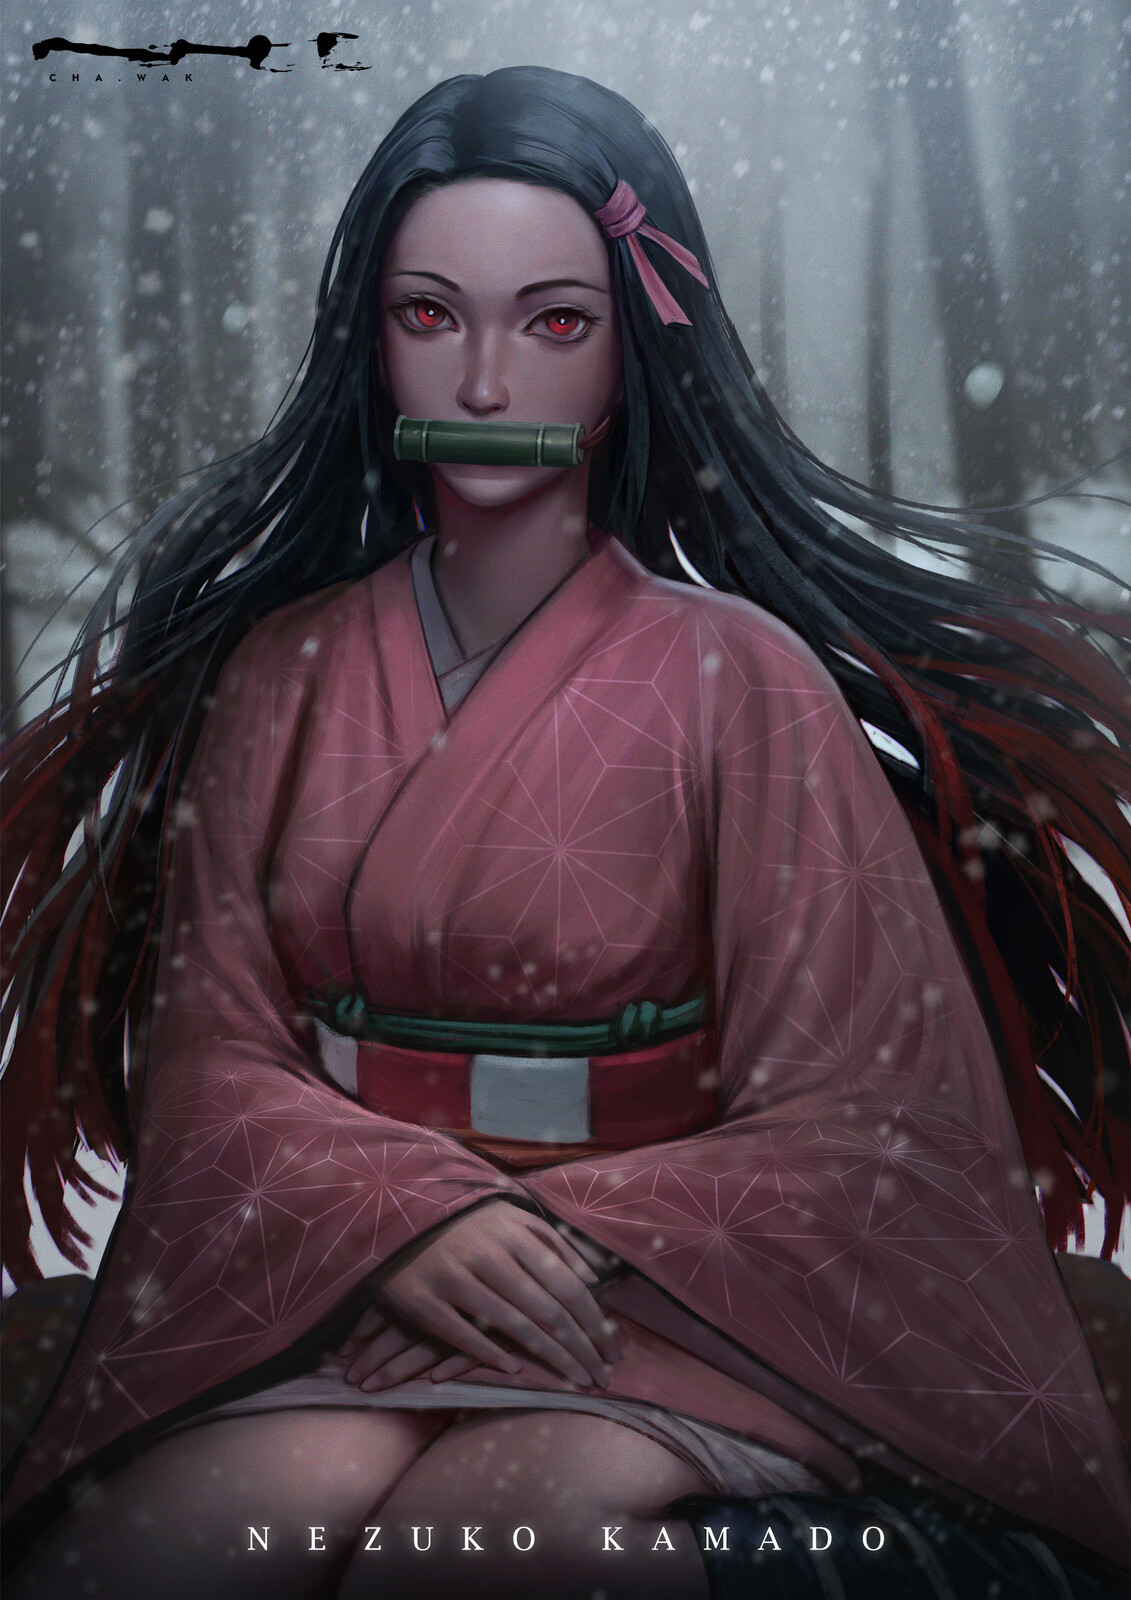 Demon Slayer - Nezuko Kamado - Fanart